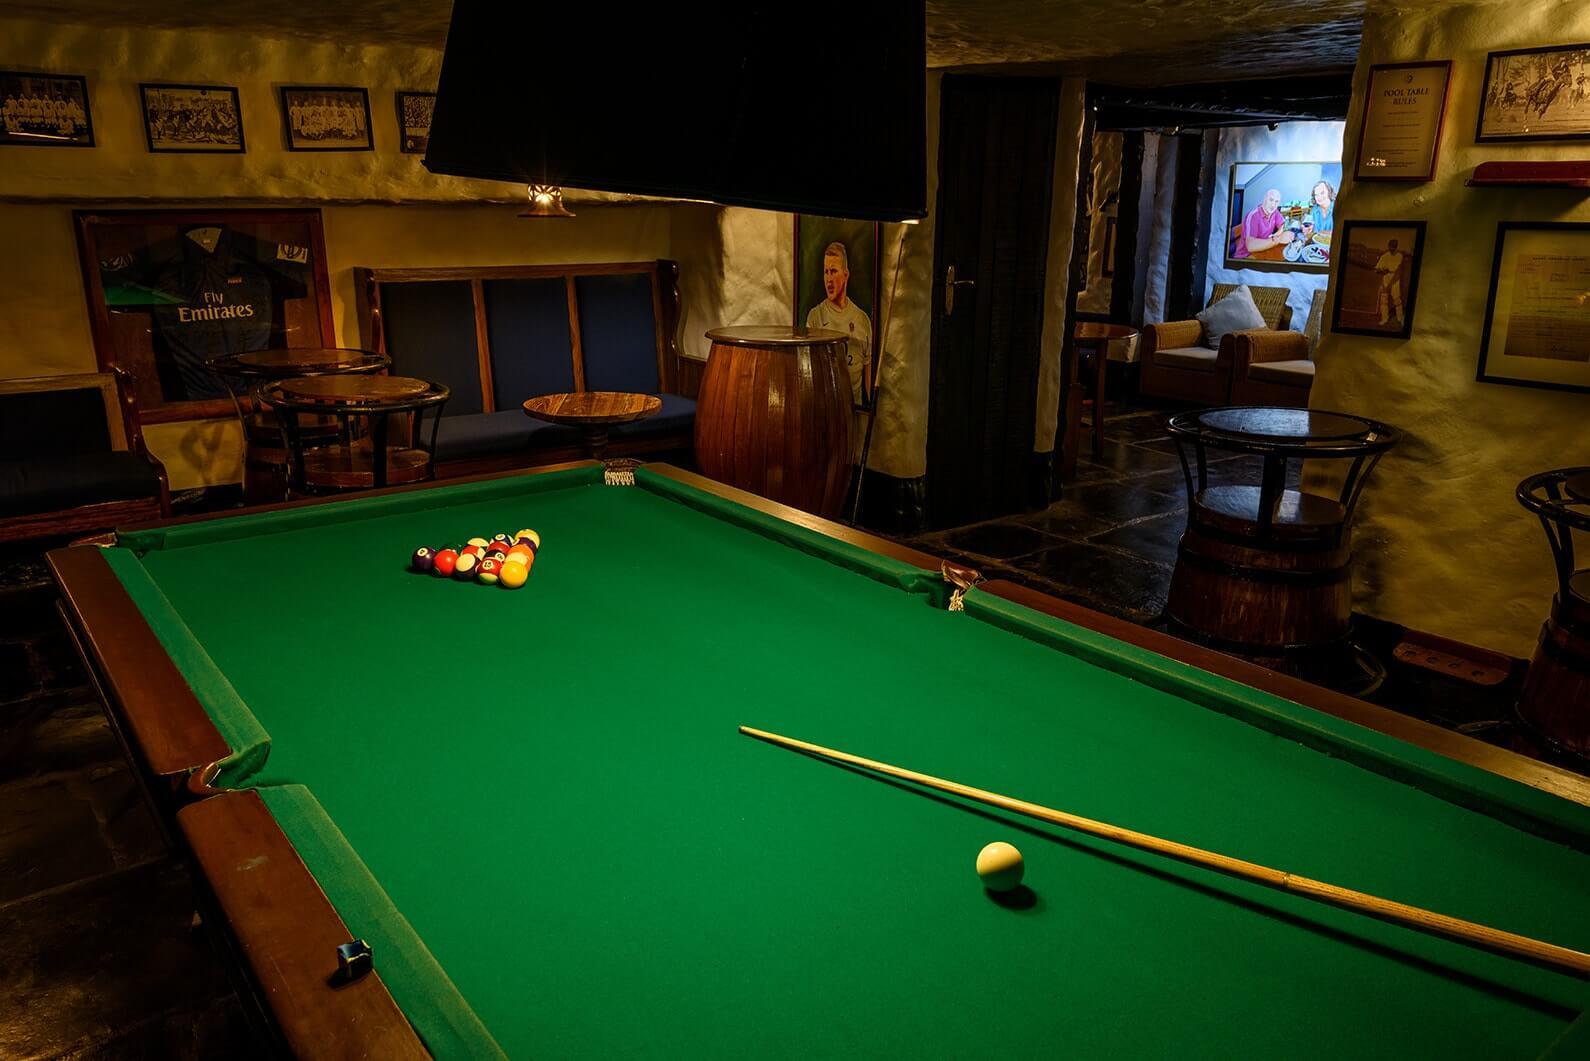 Pool Table at Attwood's Pub